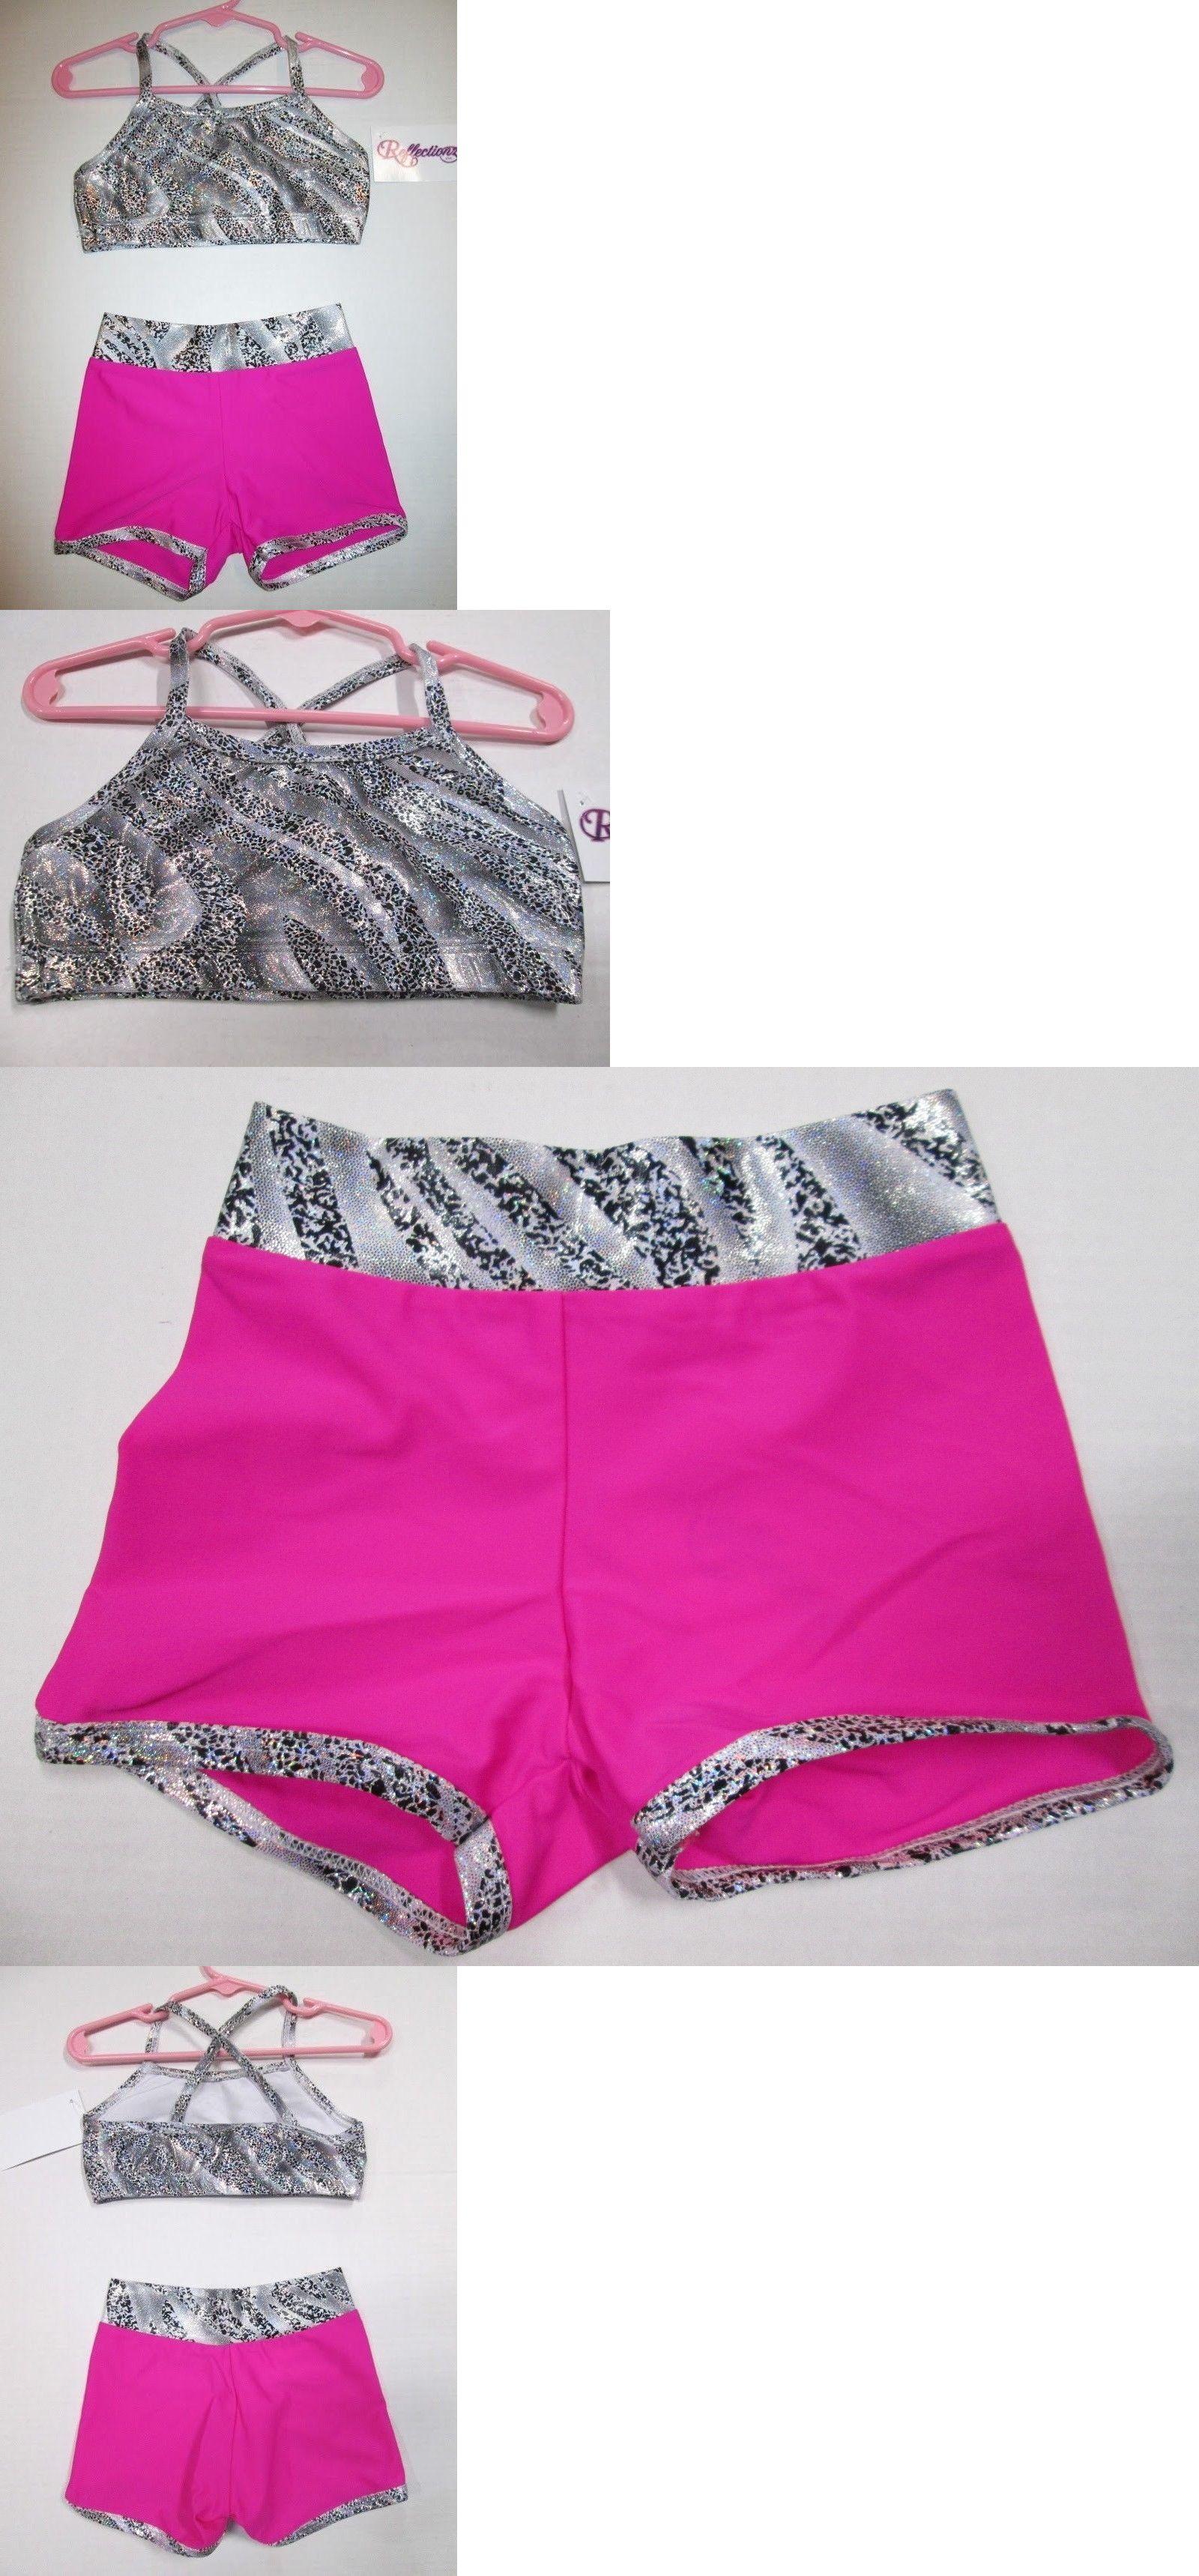 26d755ea3 Outfits 152355  New Crop Bra Top Shorts Set Size 4 Xs Sc Child Lot ...